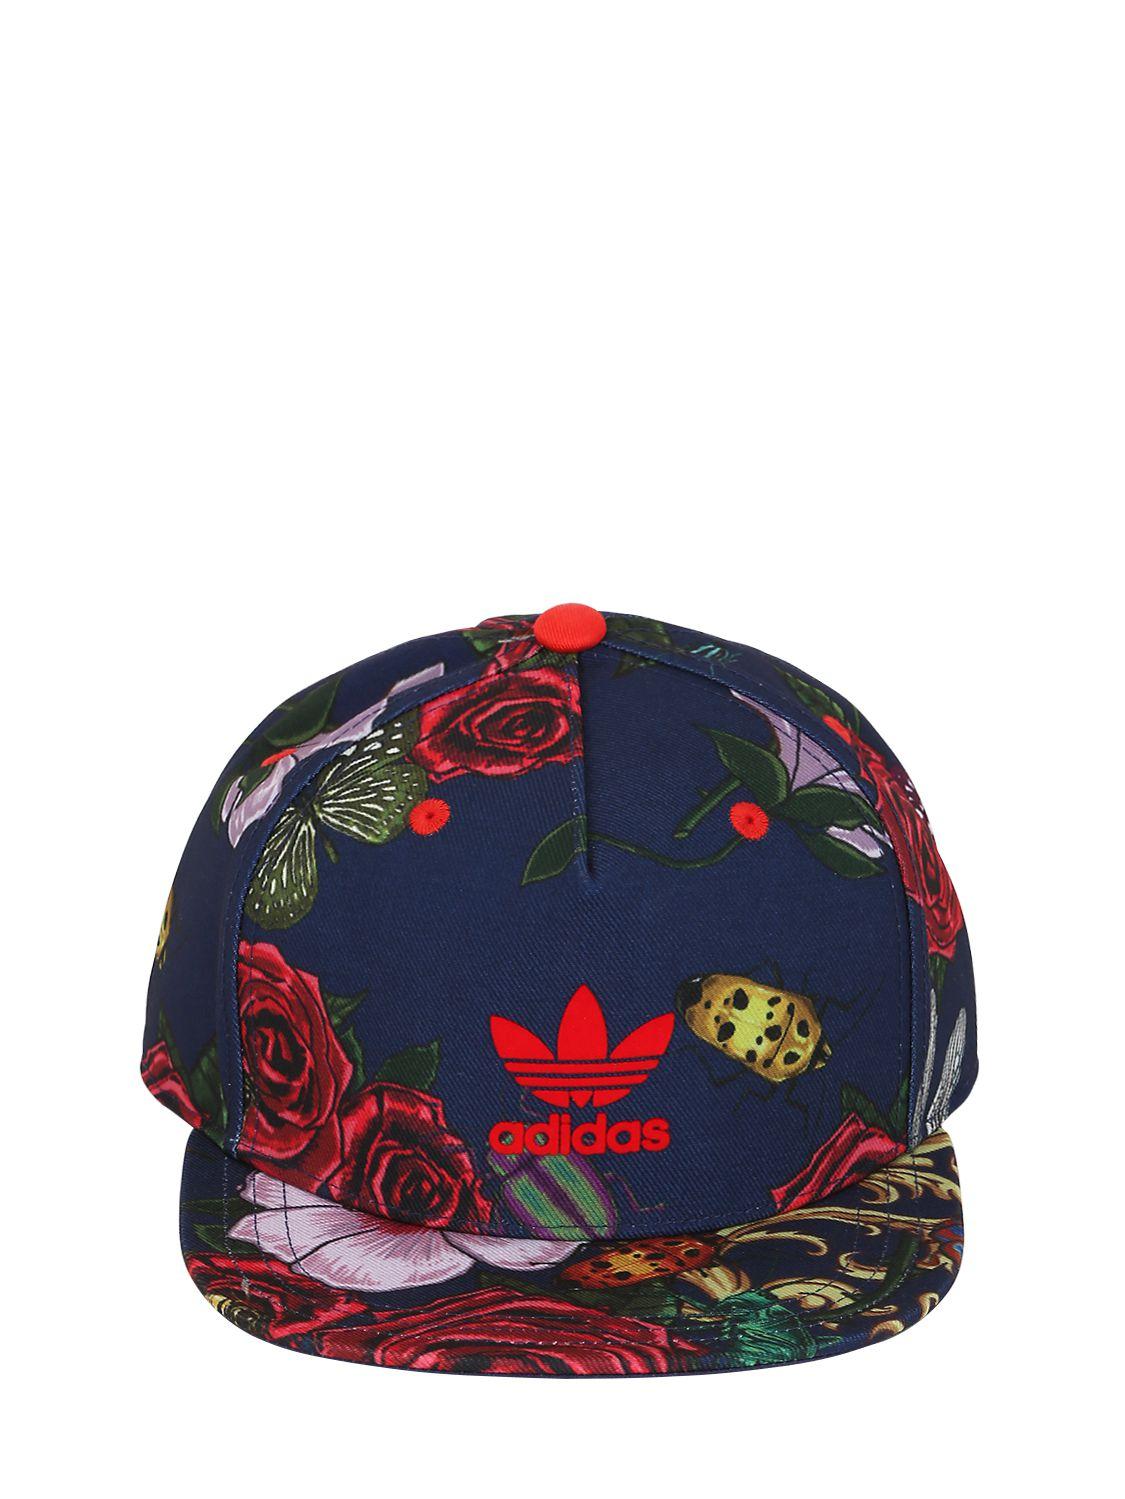 ... flower cap new concept 702c3 8c4cd good adidas originals floral printed  baseball hat in blue lyst babdf 89726 ... e75ae3e84e19